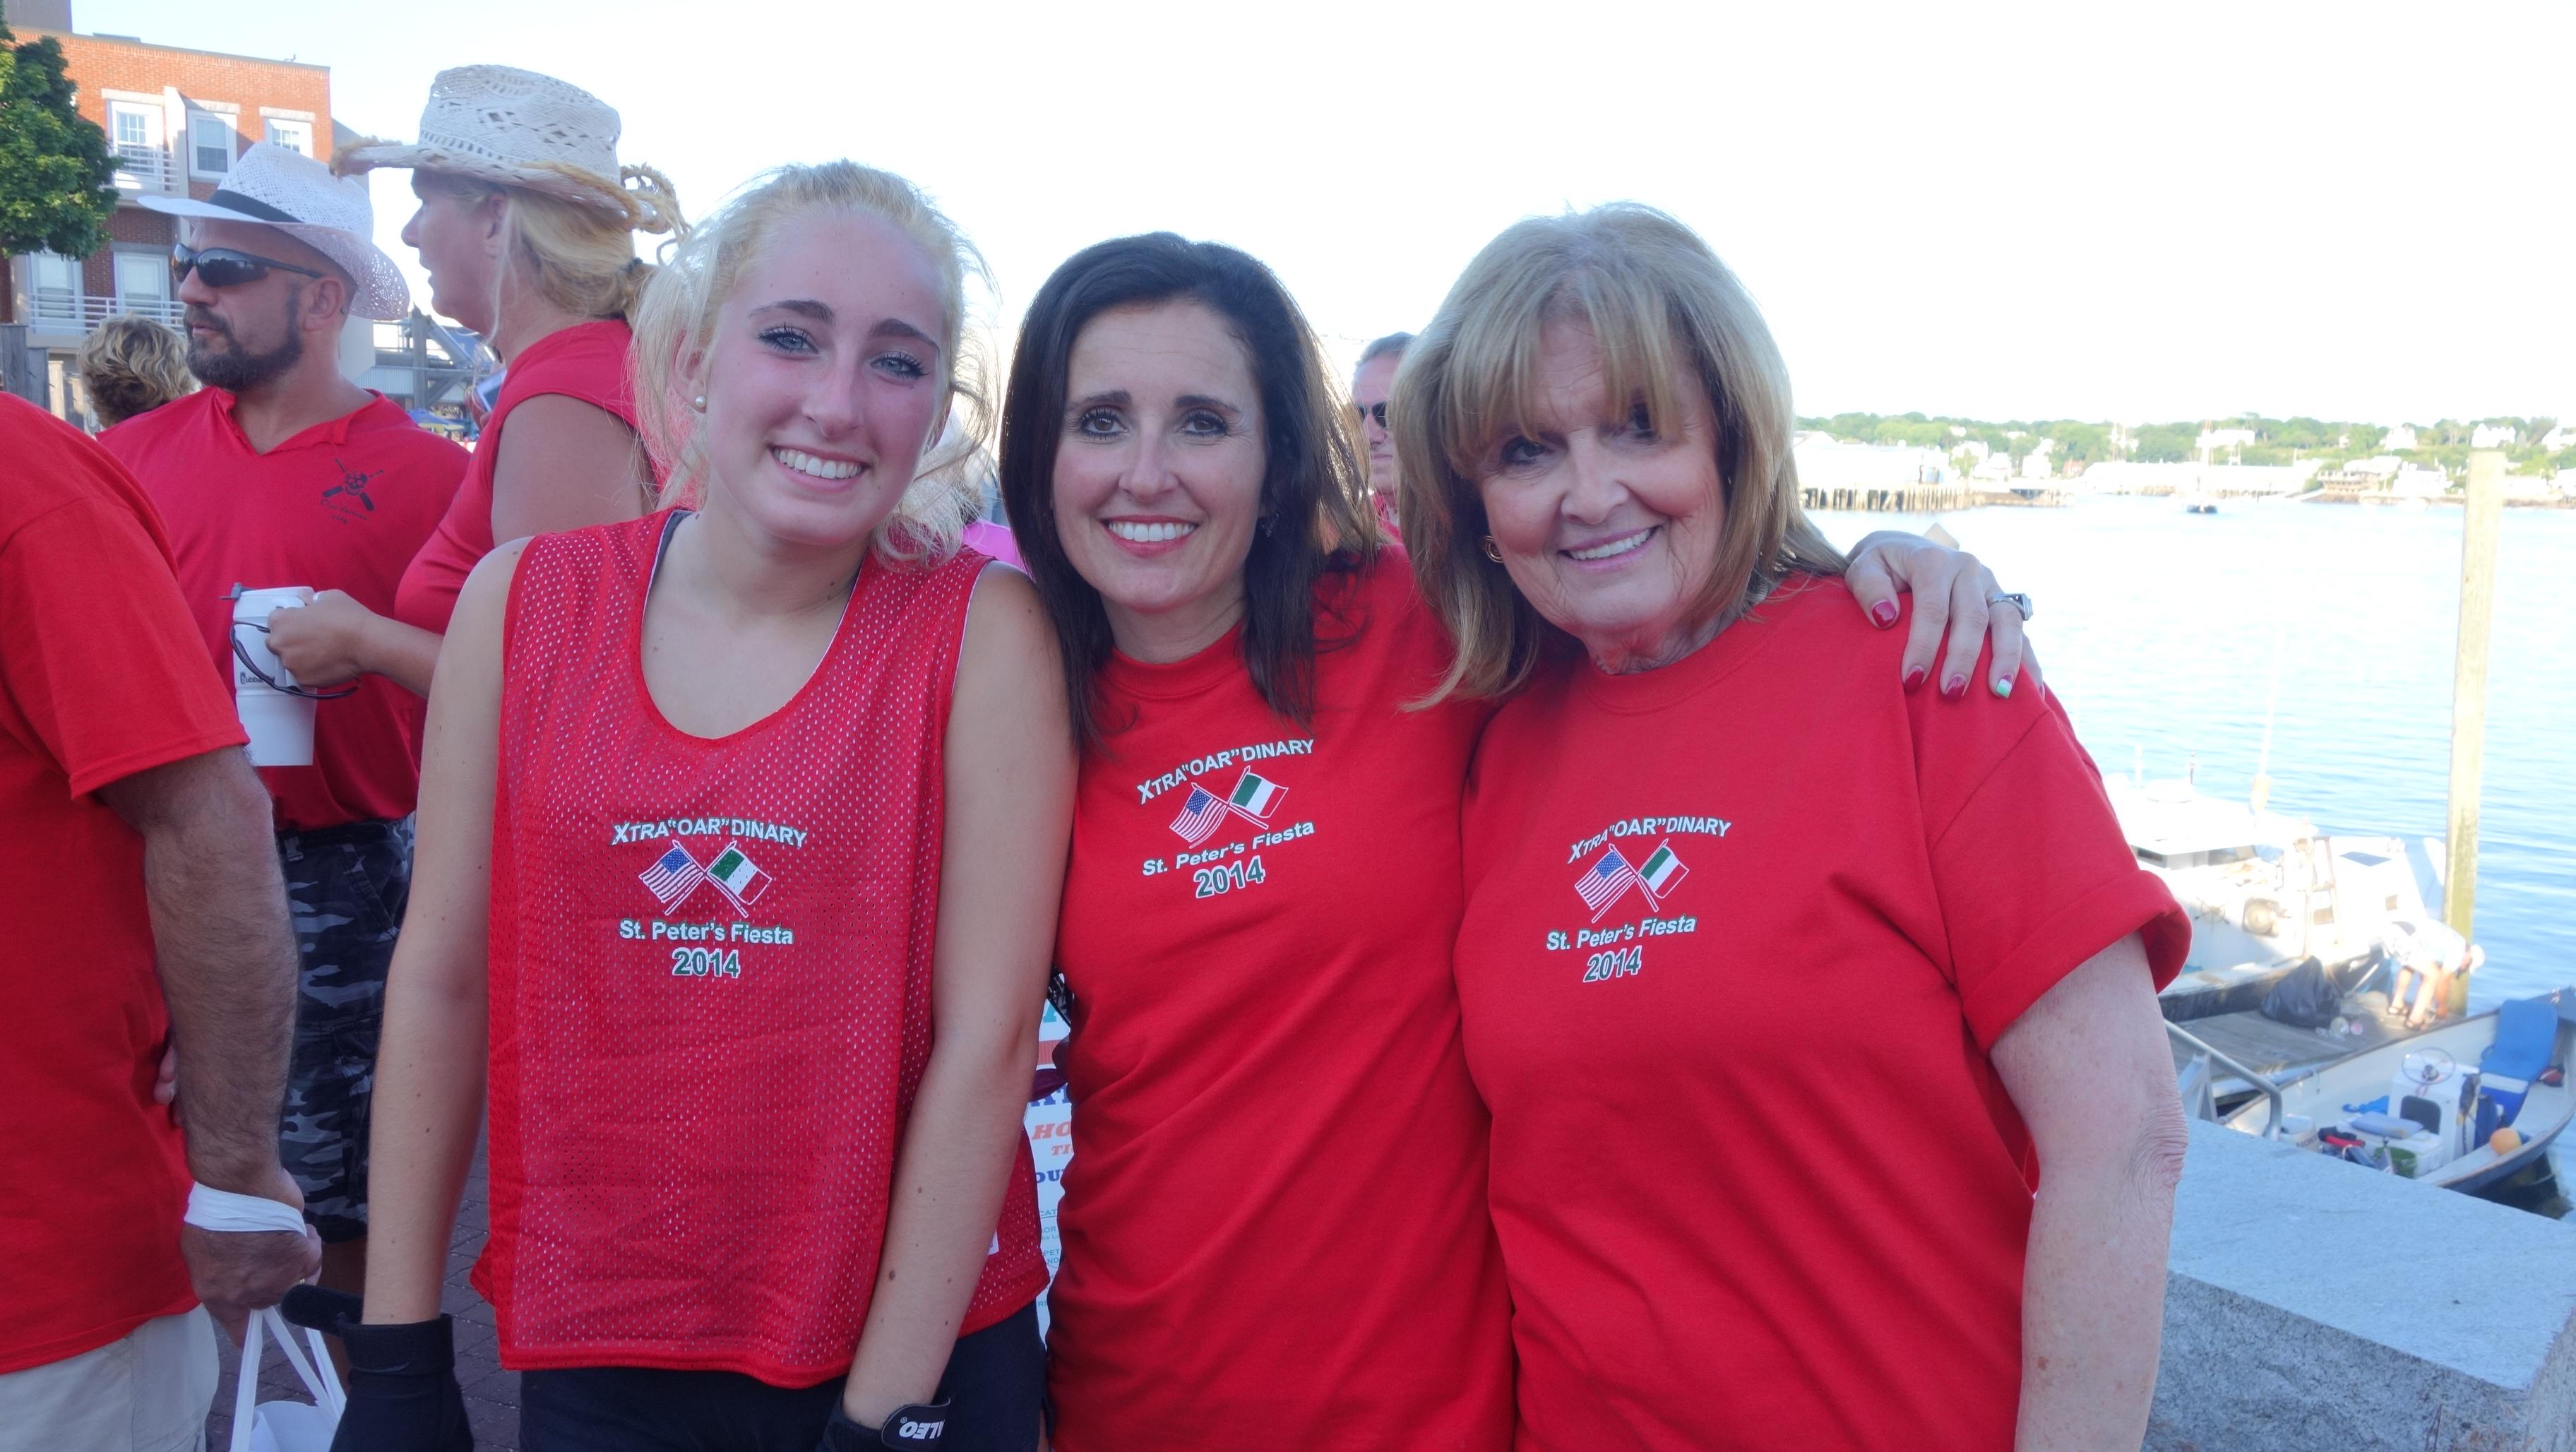 Amanda Race St. Peter's Fiesta 2014 Camps! 371